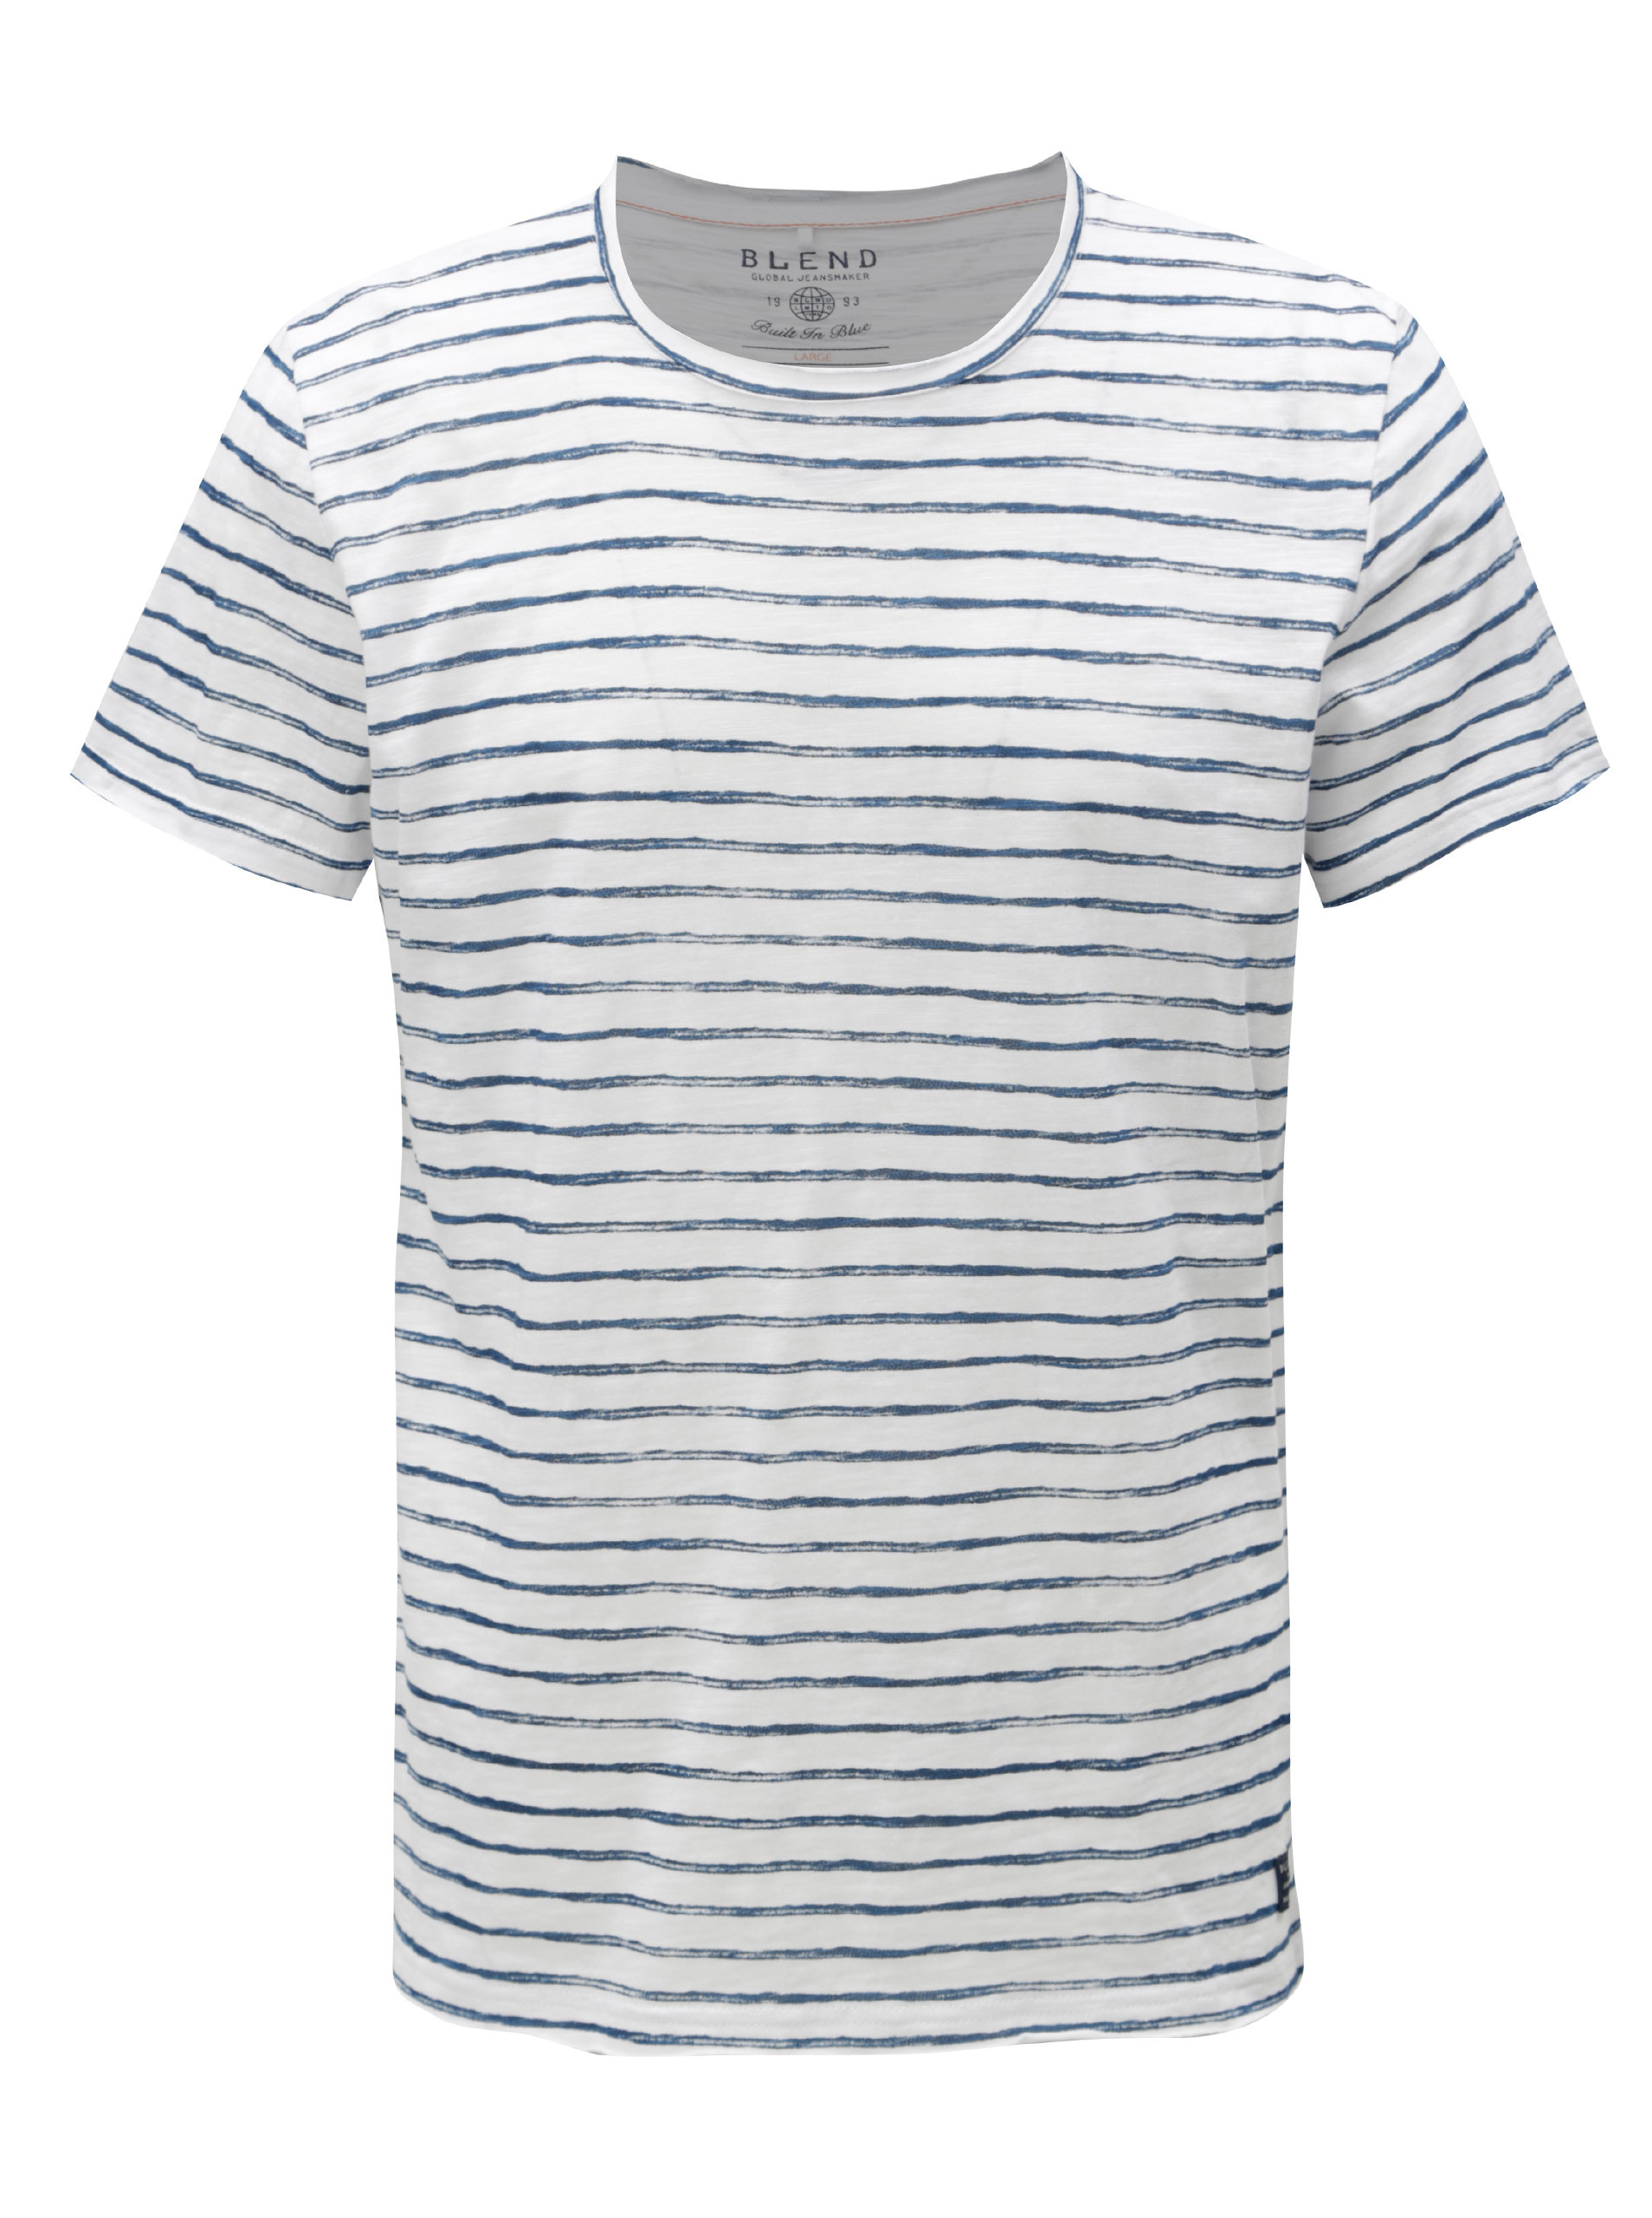 3244ff1fe48e Modro-bílé pruhované slim fit tričko Blend ...